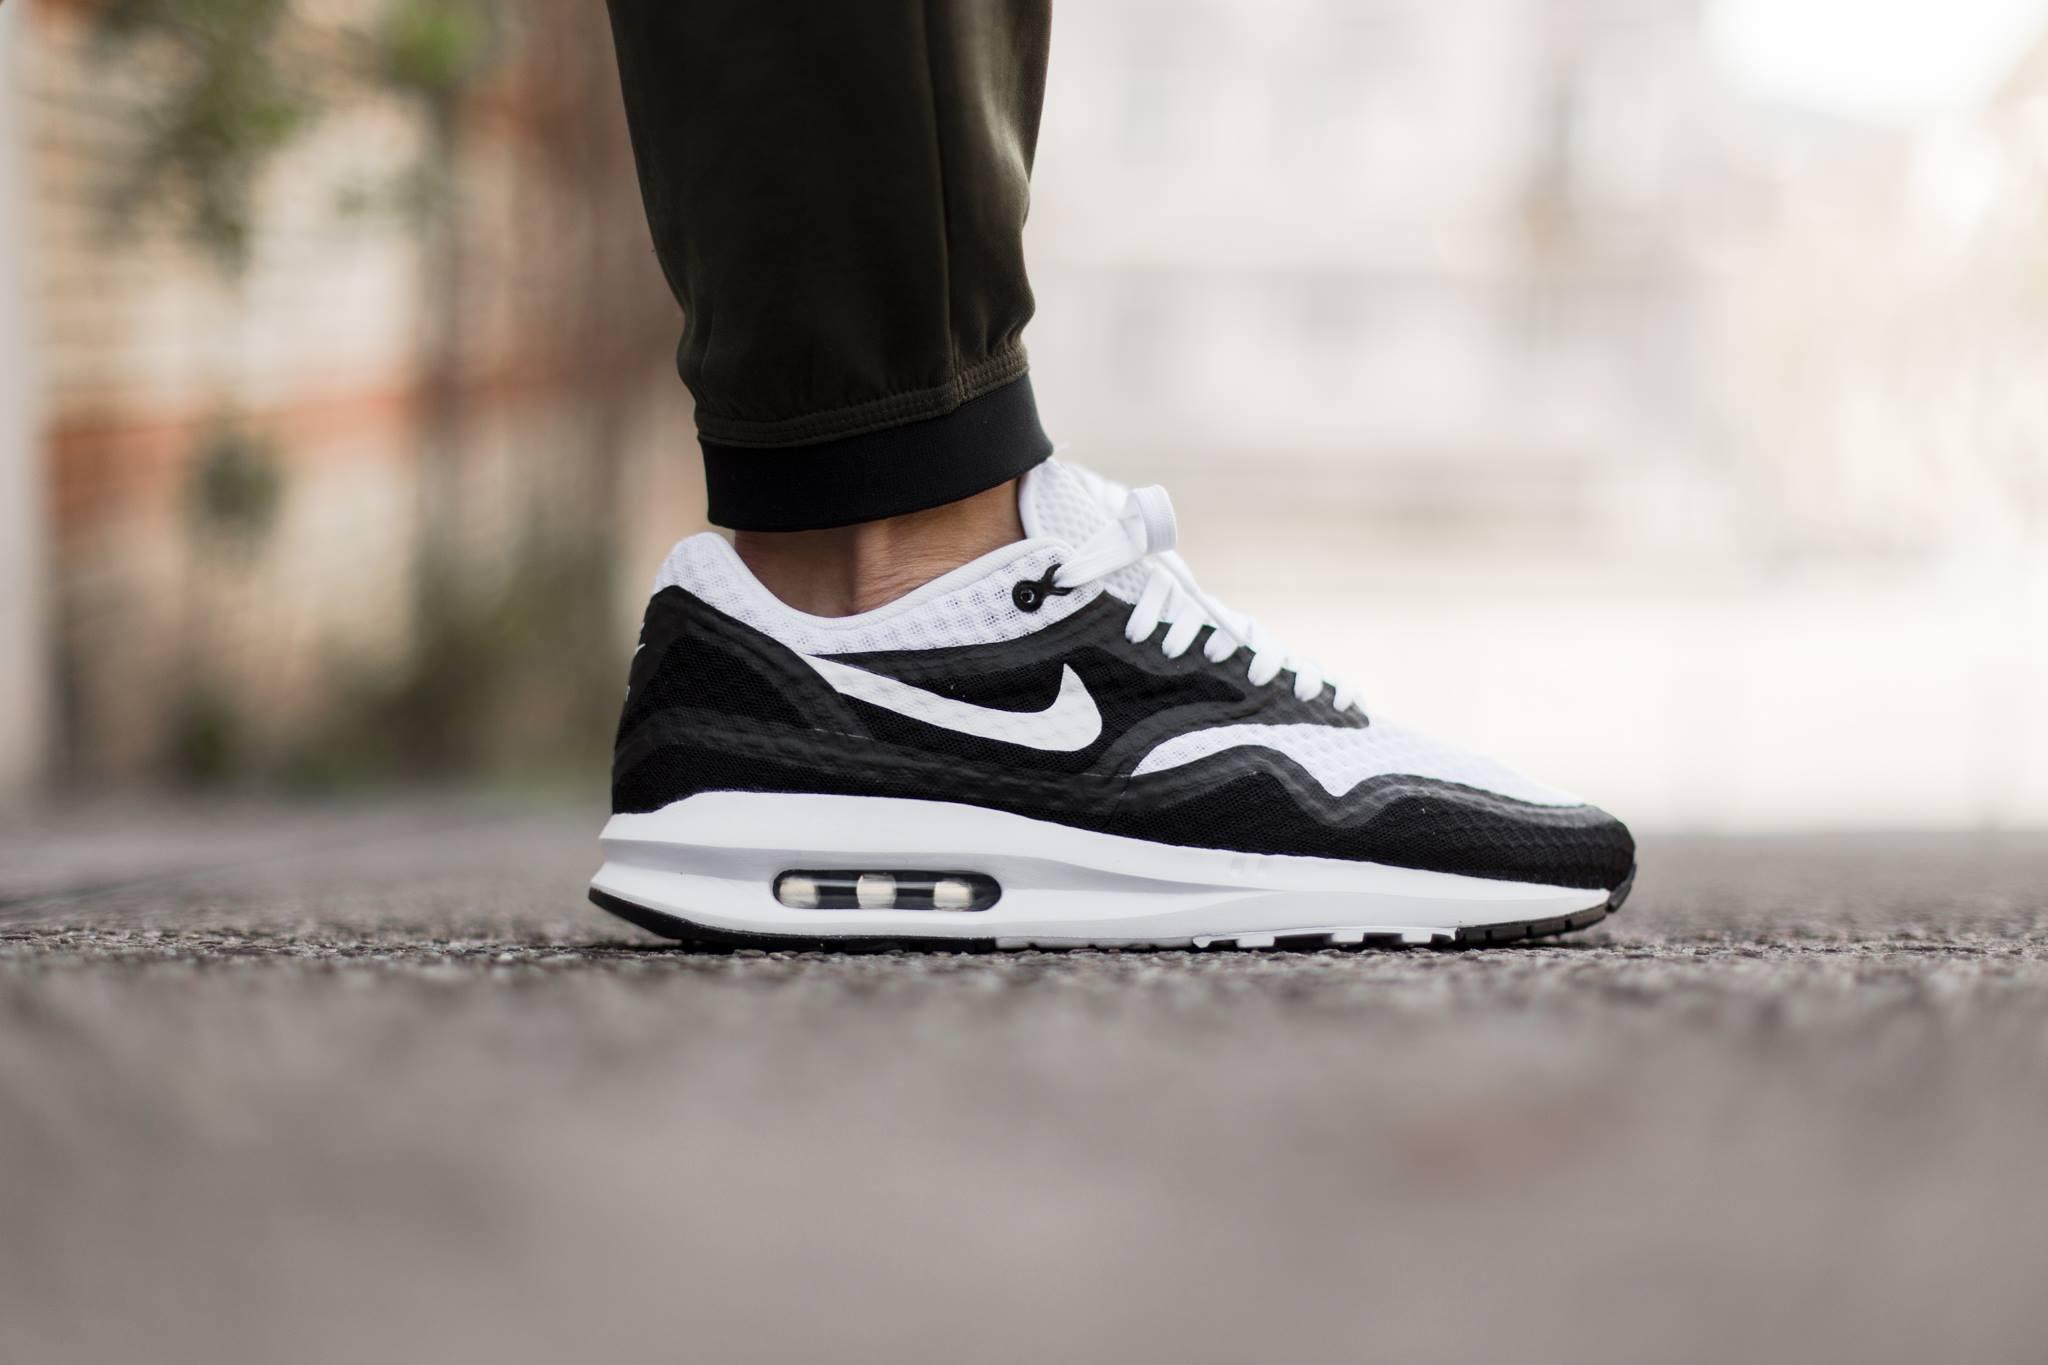 Nike Air Max Lunar1 Breeze Black White Sneakers Addict